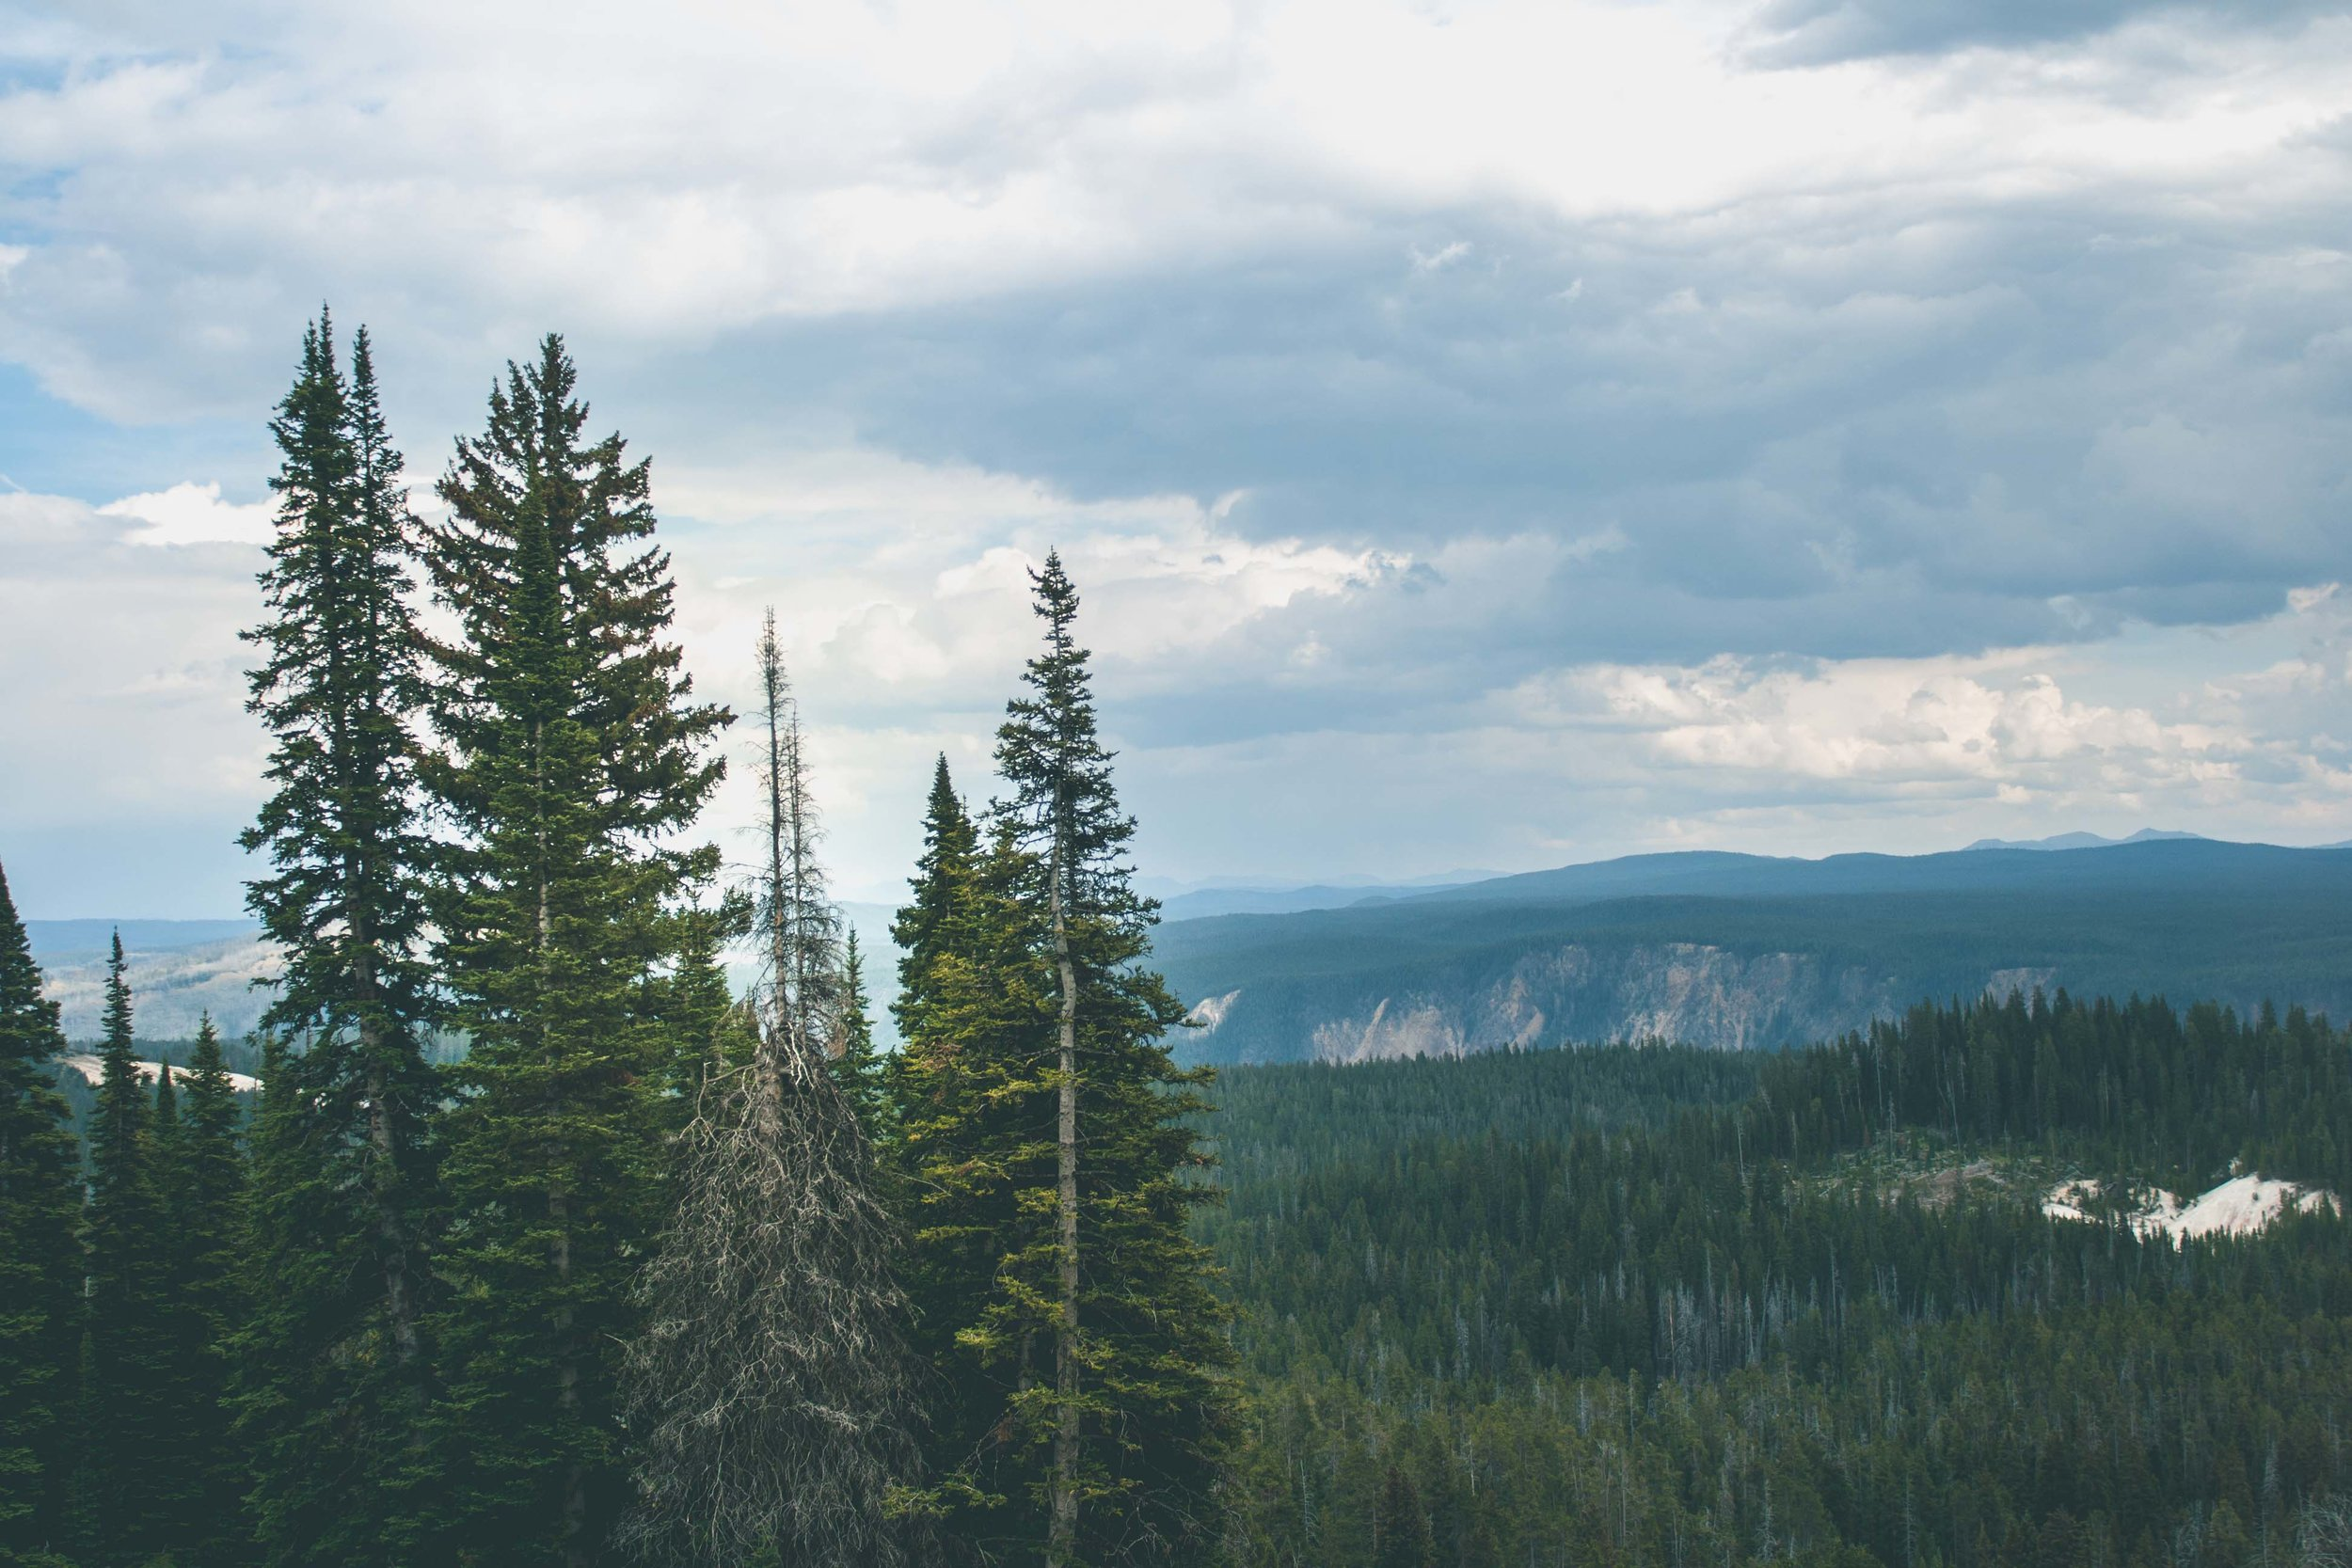 Yellowstone National Park, Wyoming. Augusti 2017